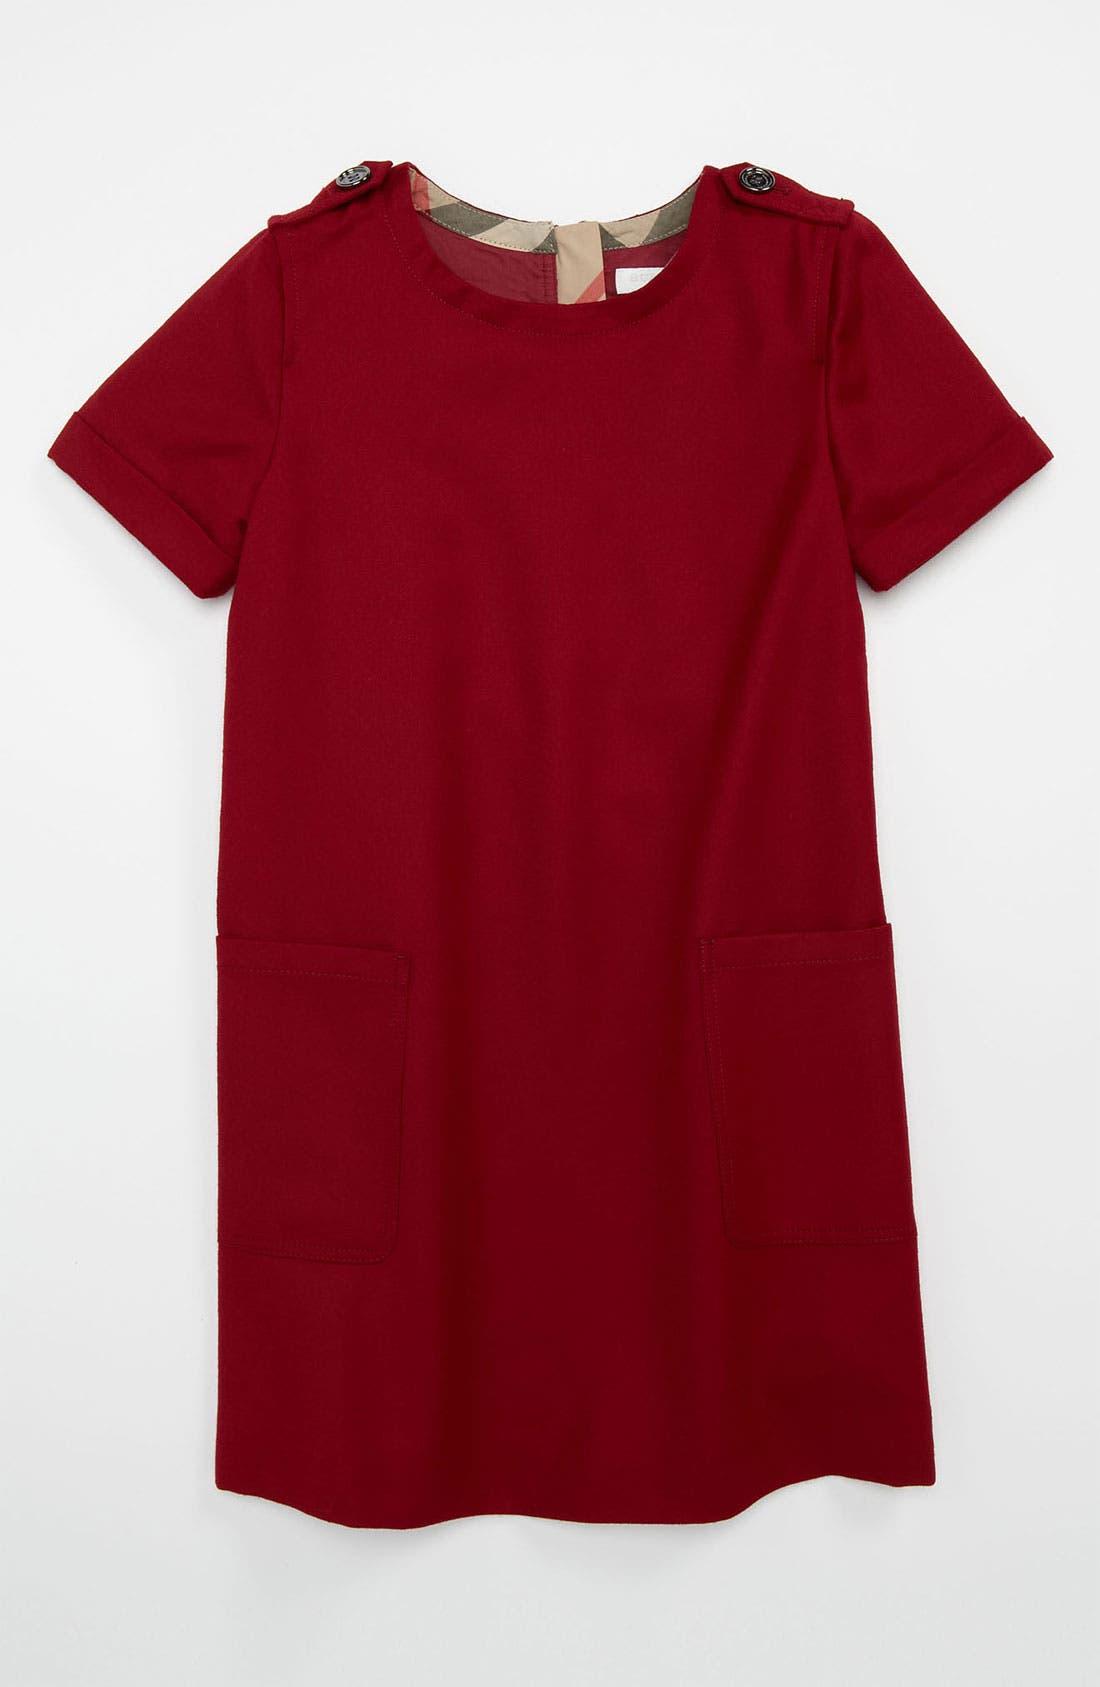 Main Image - Burberry Shift Dress (Little Girls & Big Girls)